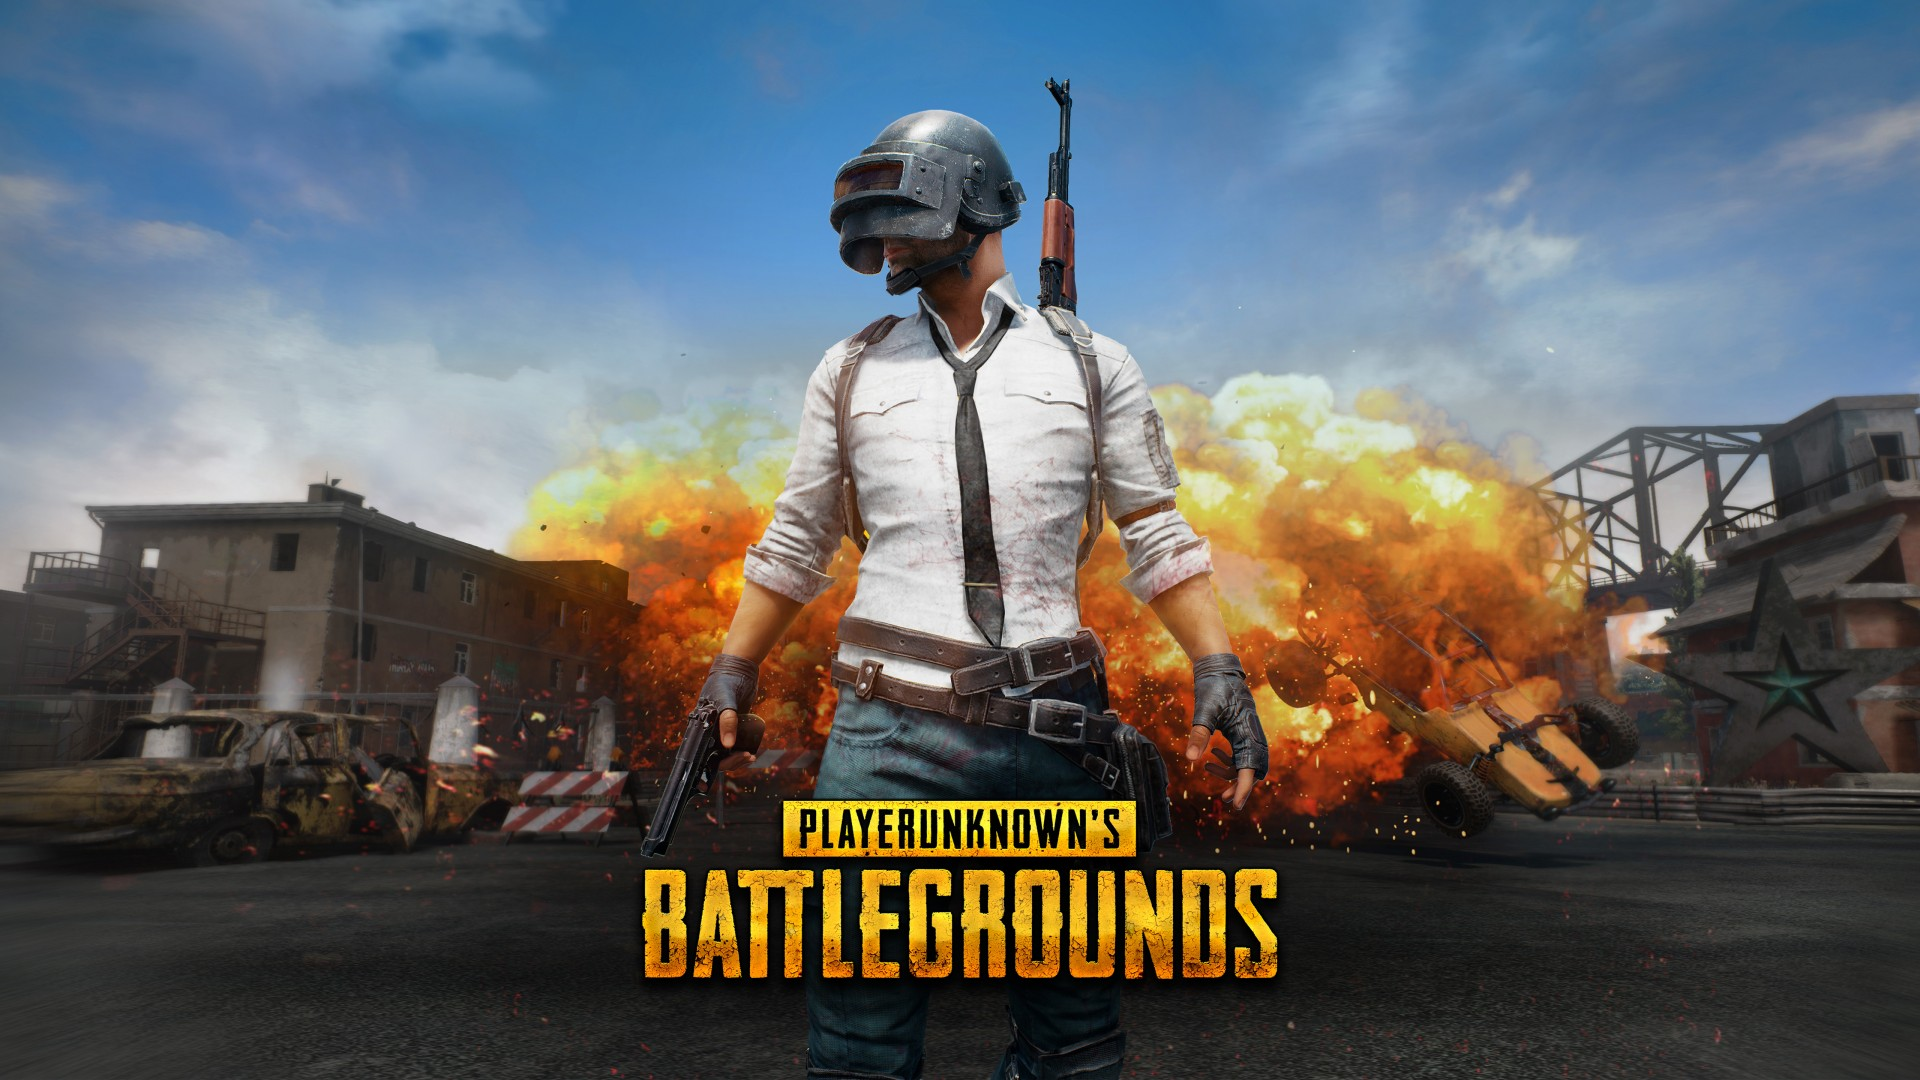 playerunknowns_battlegrounds_5k_game_2017-1920x1080